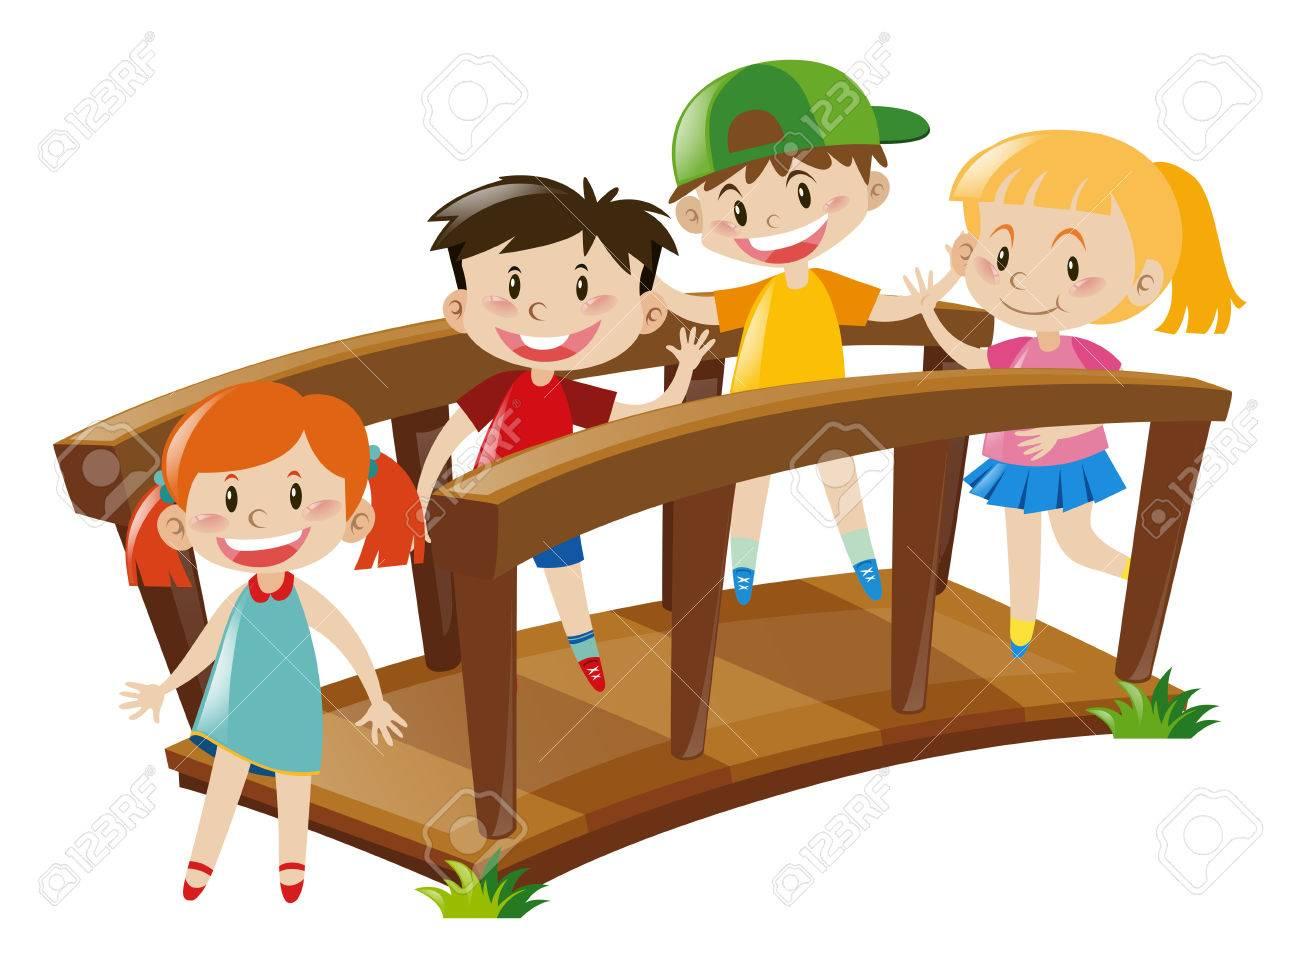 hight resolution of four kids crossing wooden bridge illustration stock vector 66895129